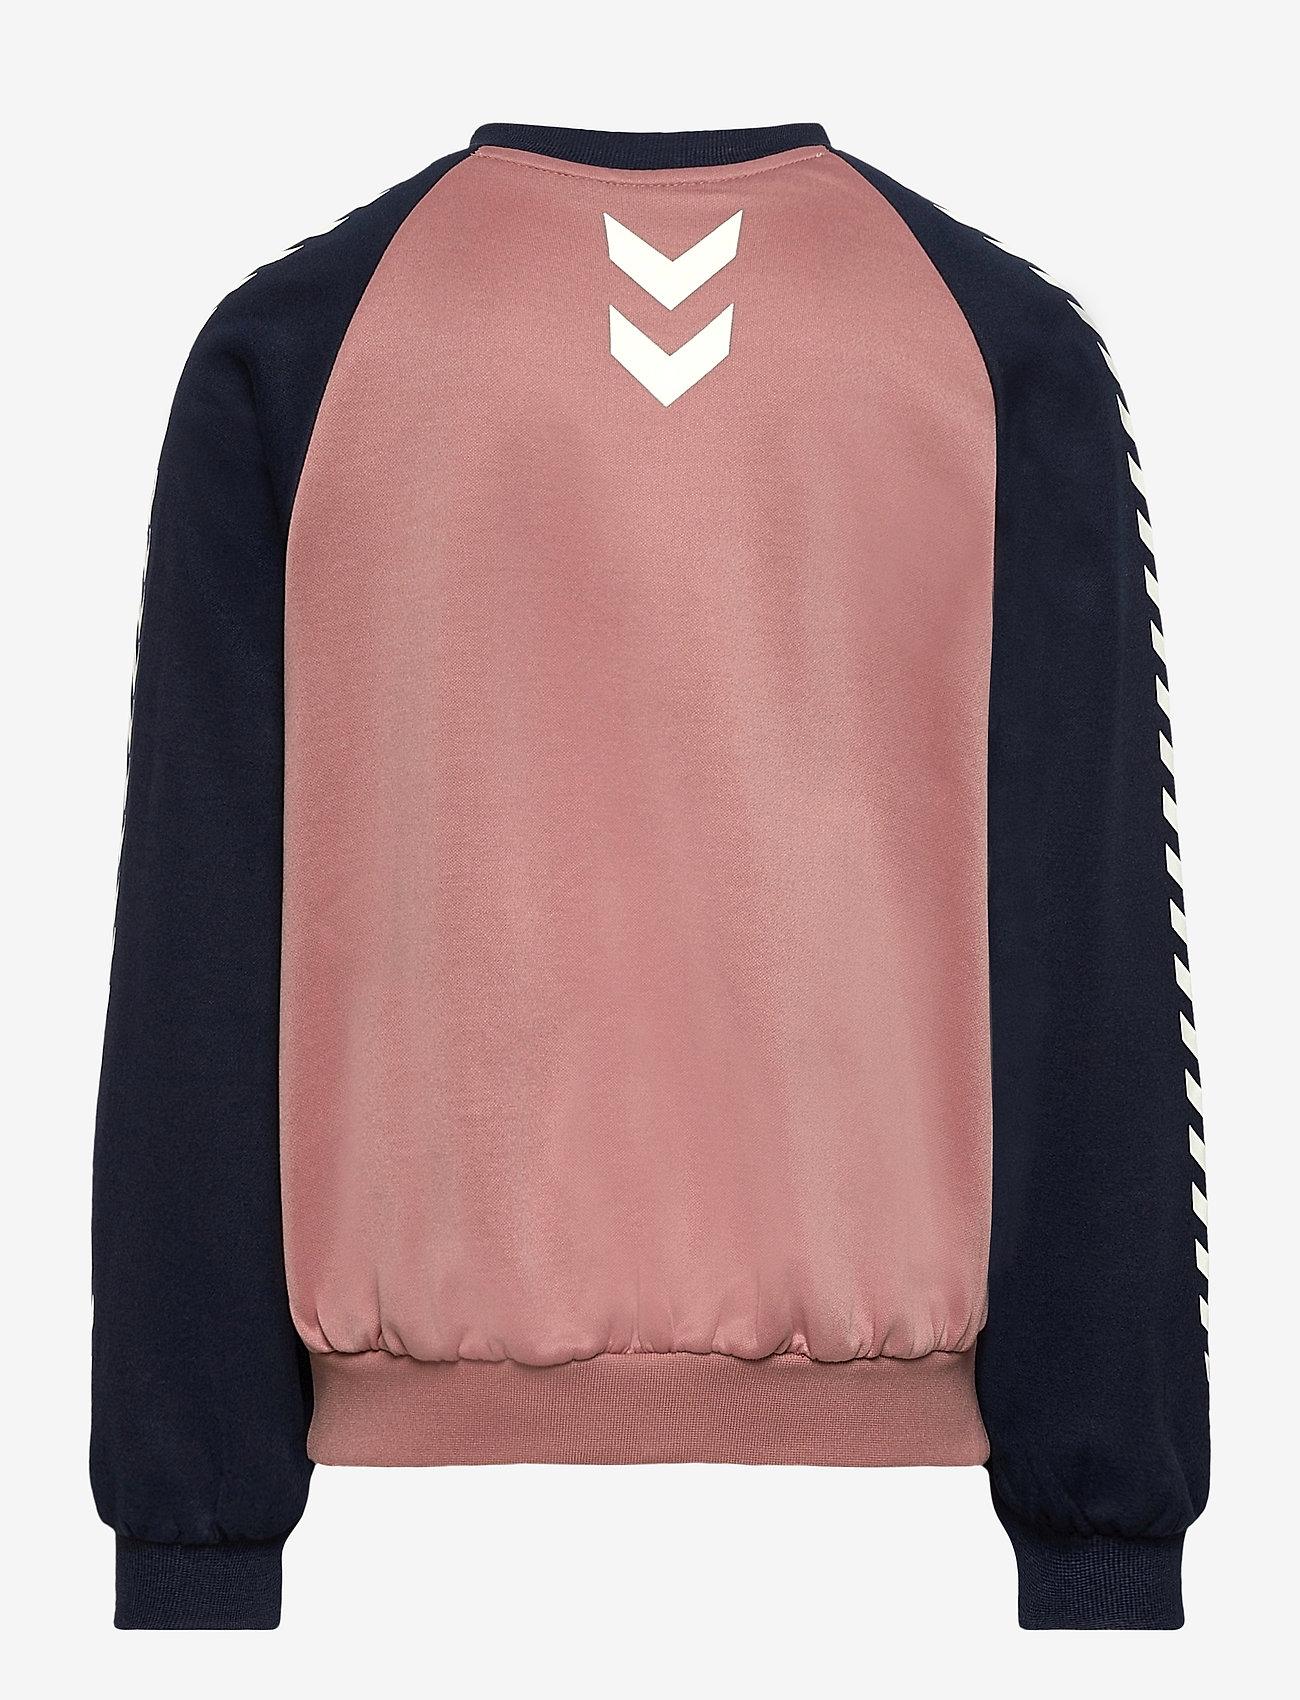 Hummel - hmlLINE ZIP JACKET - sweatshirts - black iris - 1